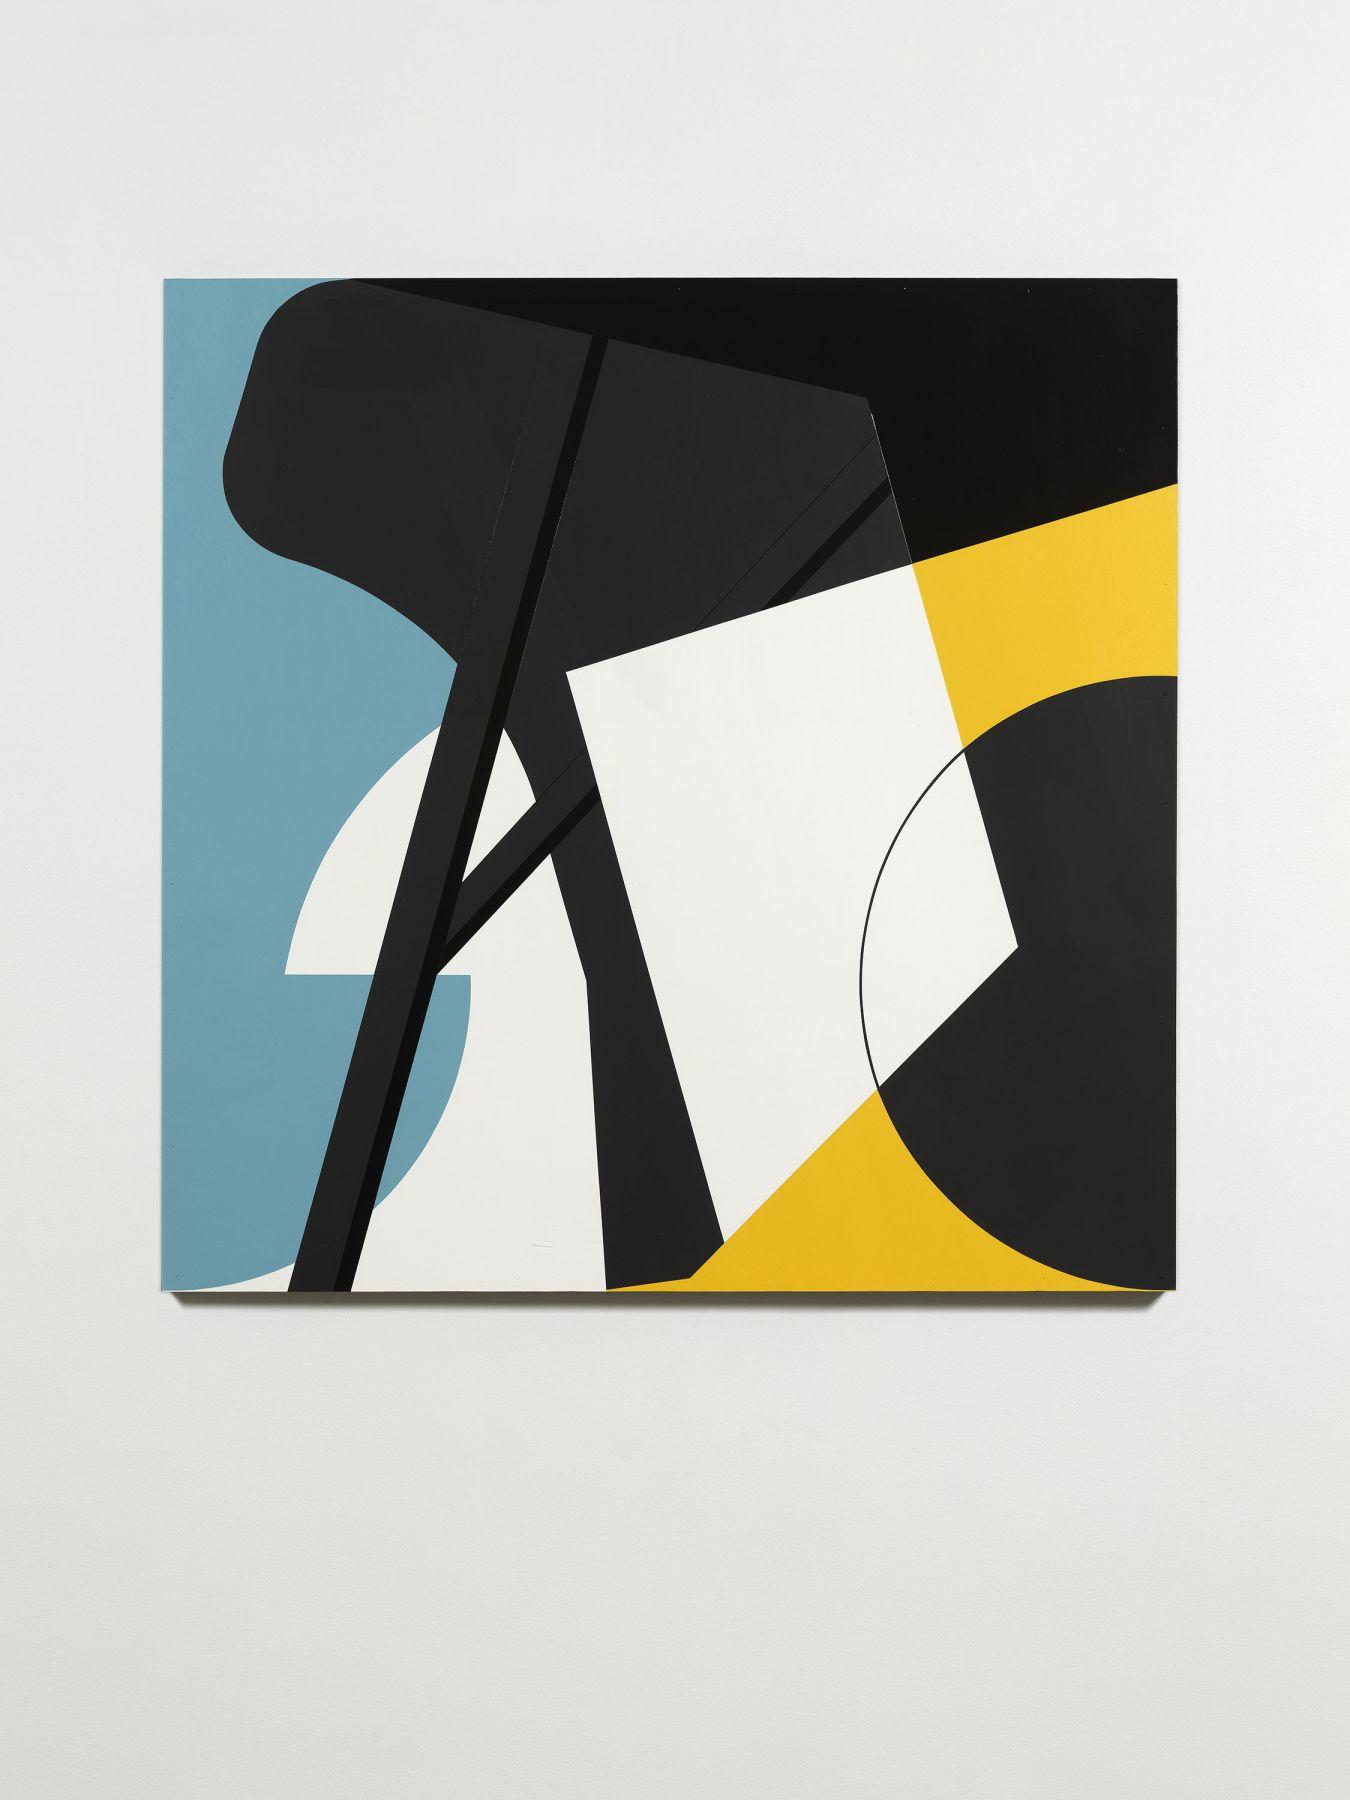 abstract, blue, yellow, white and black artwork by serge alain nitegeka